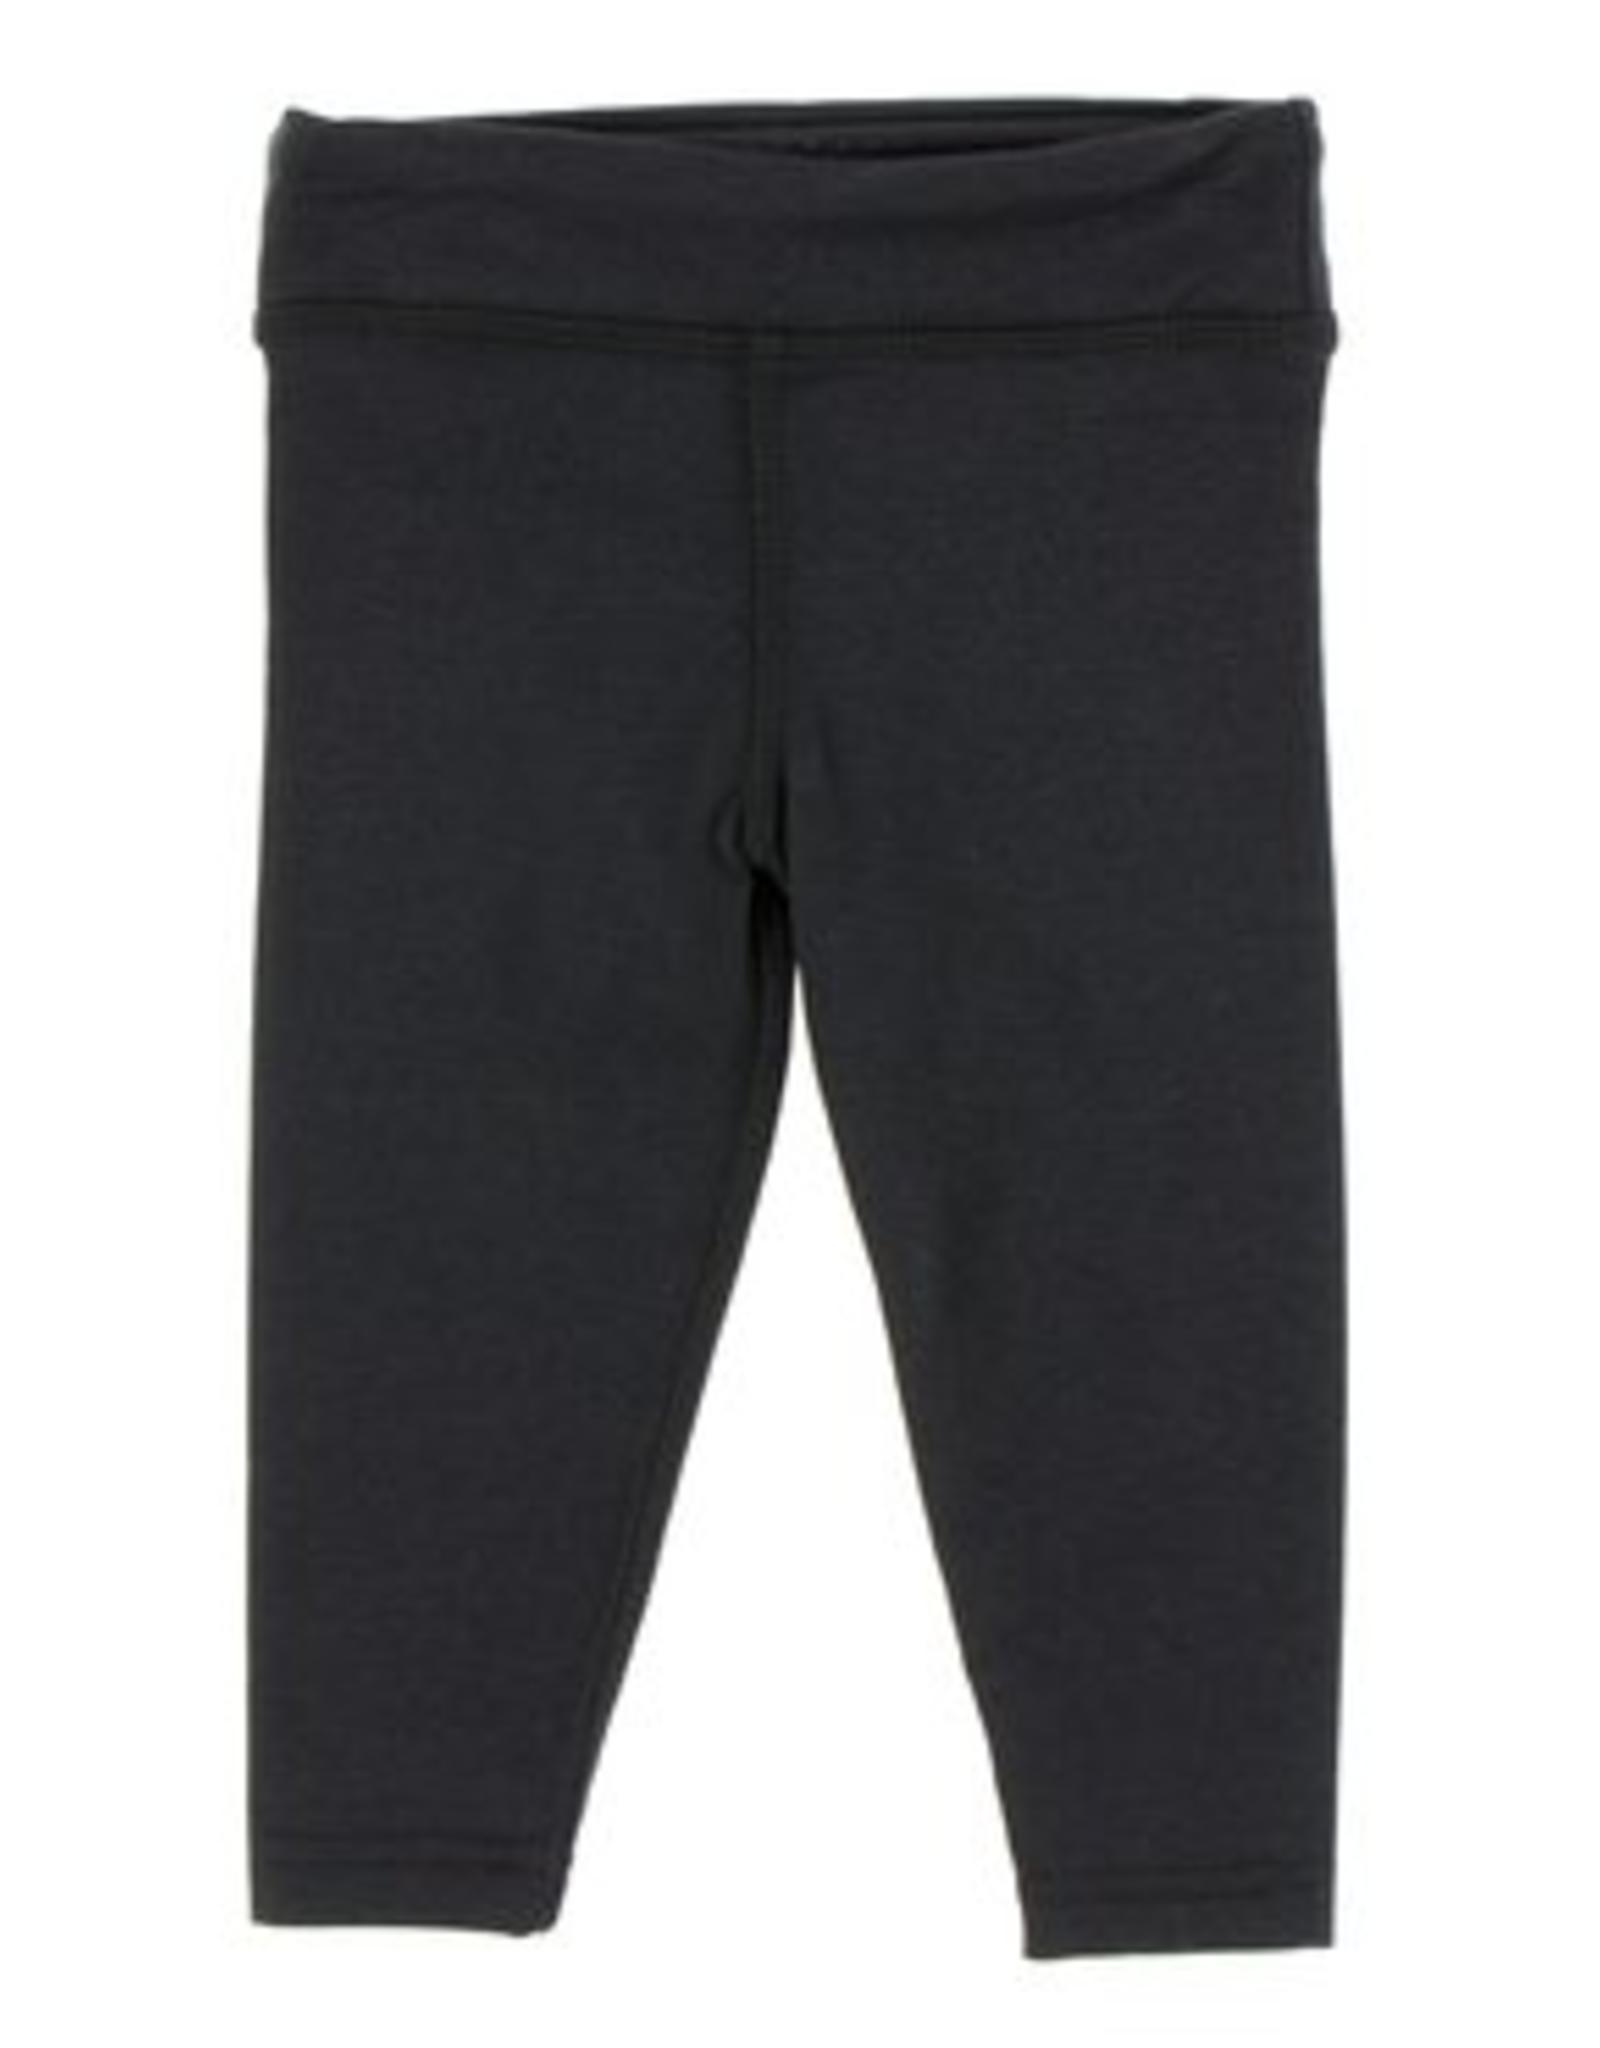 KicKee Pants KicKee Pants - Solid Performance Jersey Legging